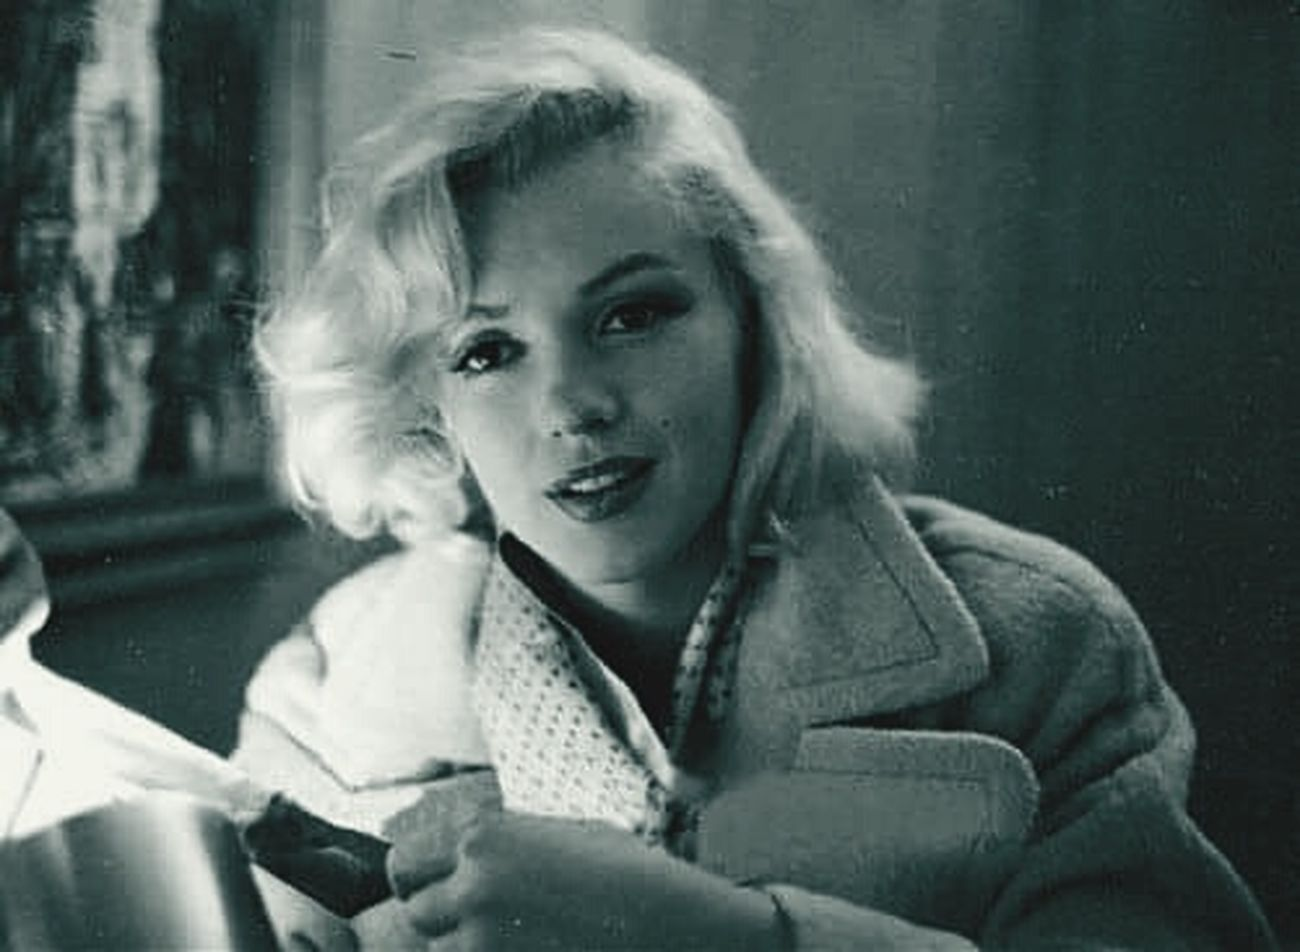 Marilyn Monroe <3 Marilynmonroe Marilyn MarilynMonroe♡ Normajeane Marilyn<3Marilyn Monroe Norma Jeane